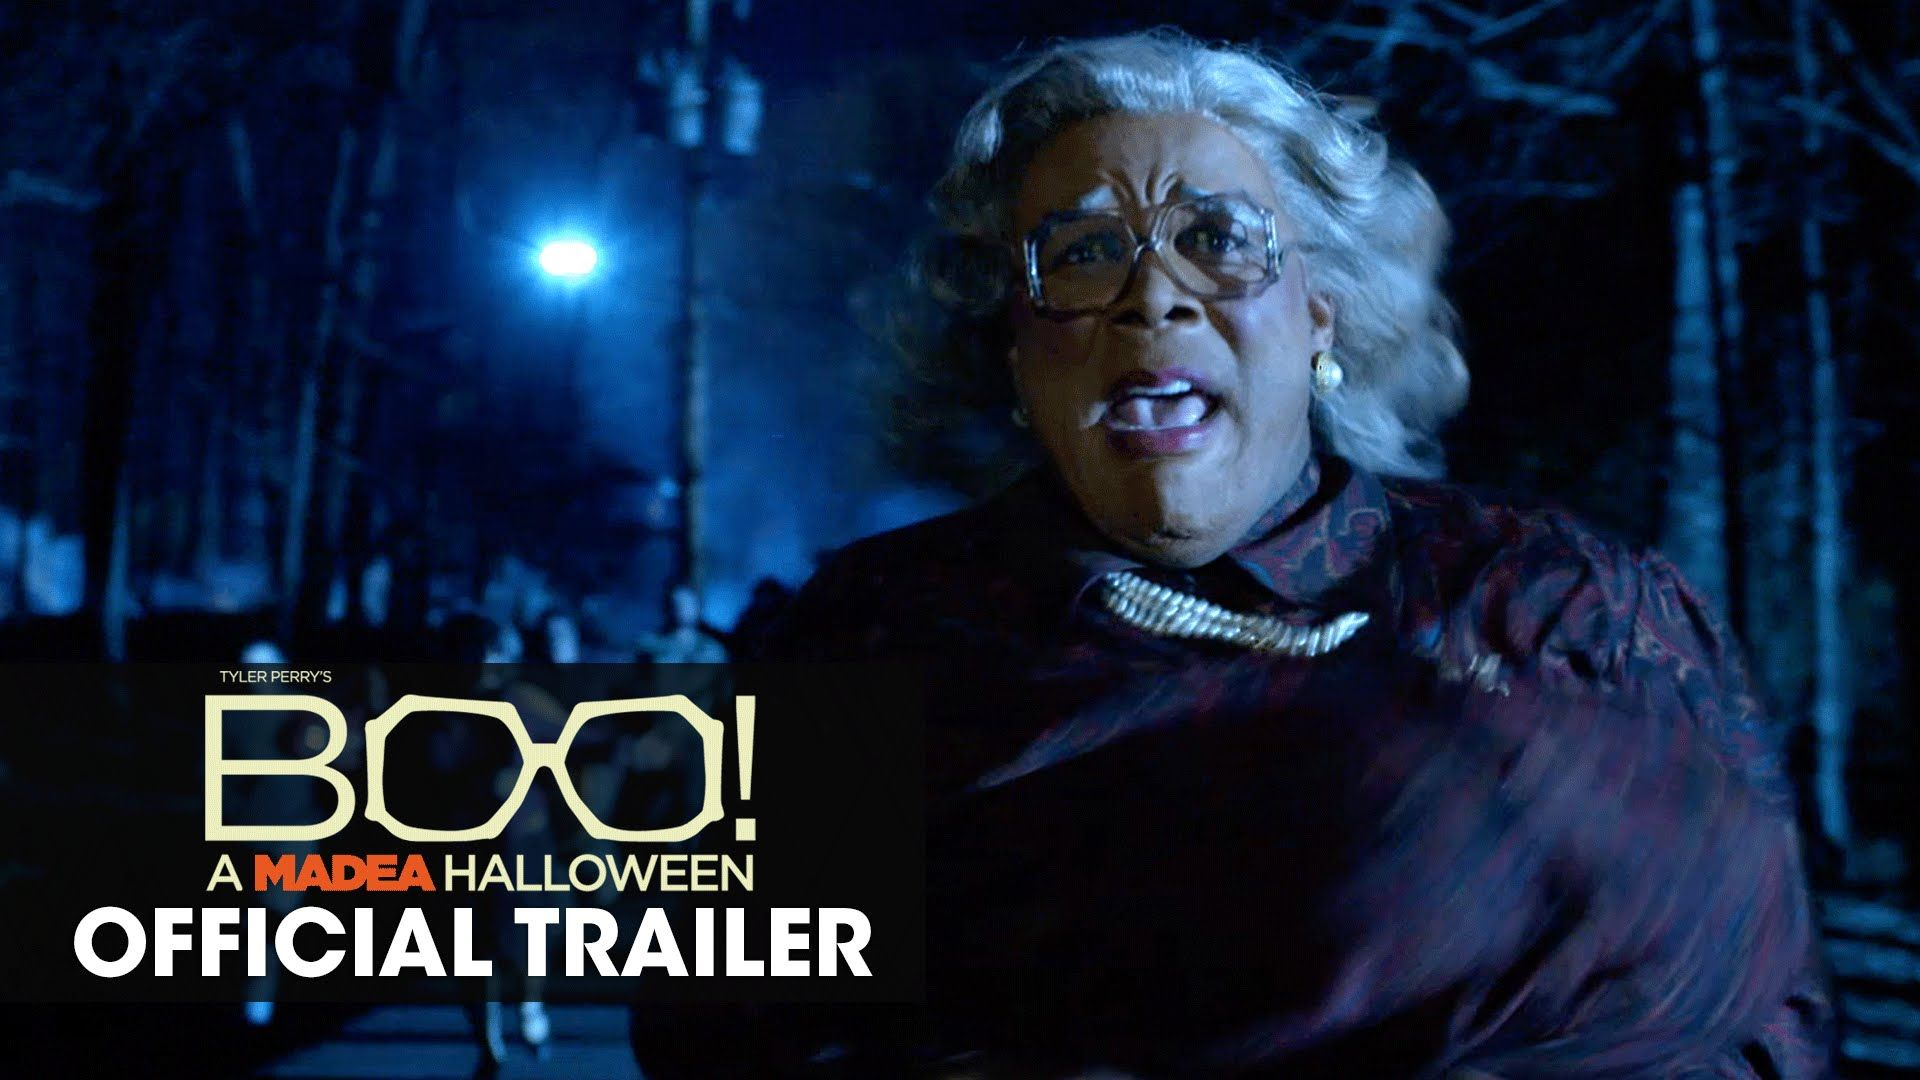 Tyler Perry's BOO! A MADEA HALLOWEEN Official Trailer